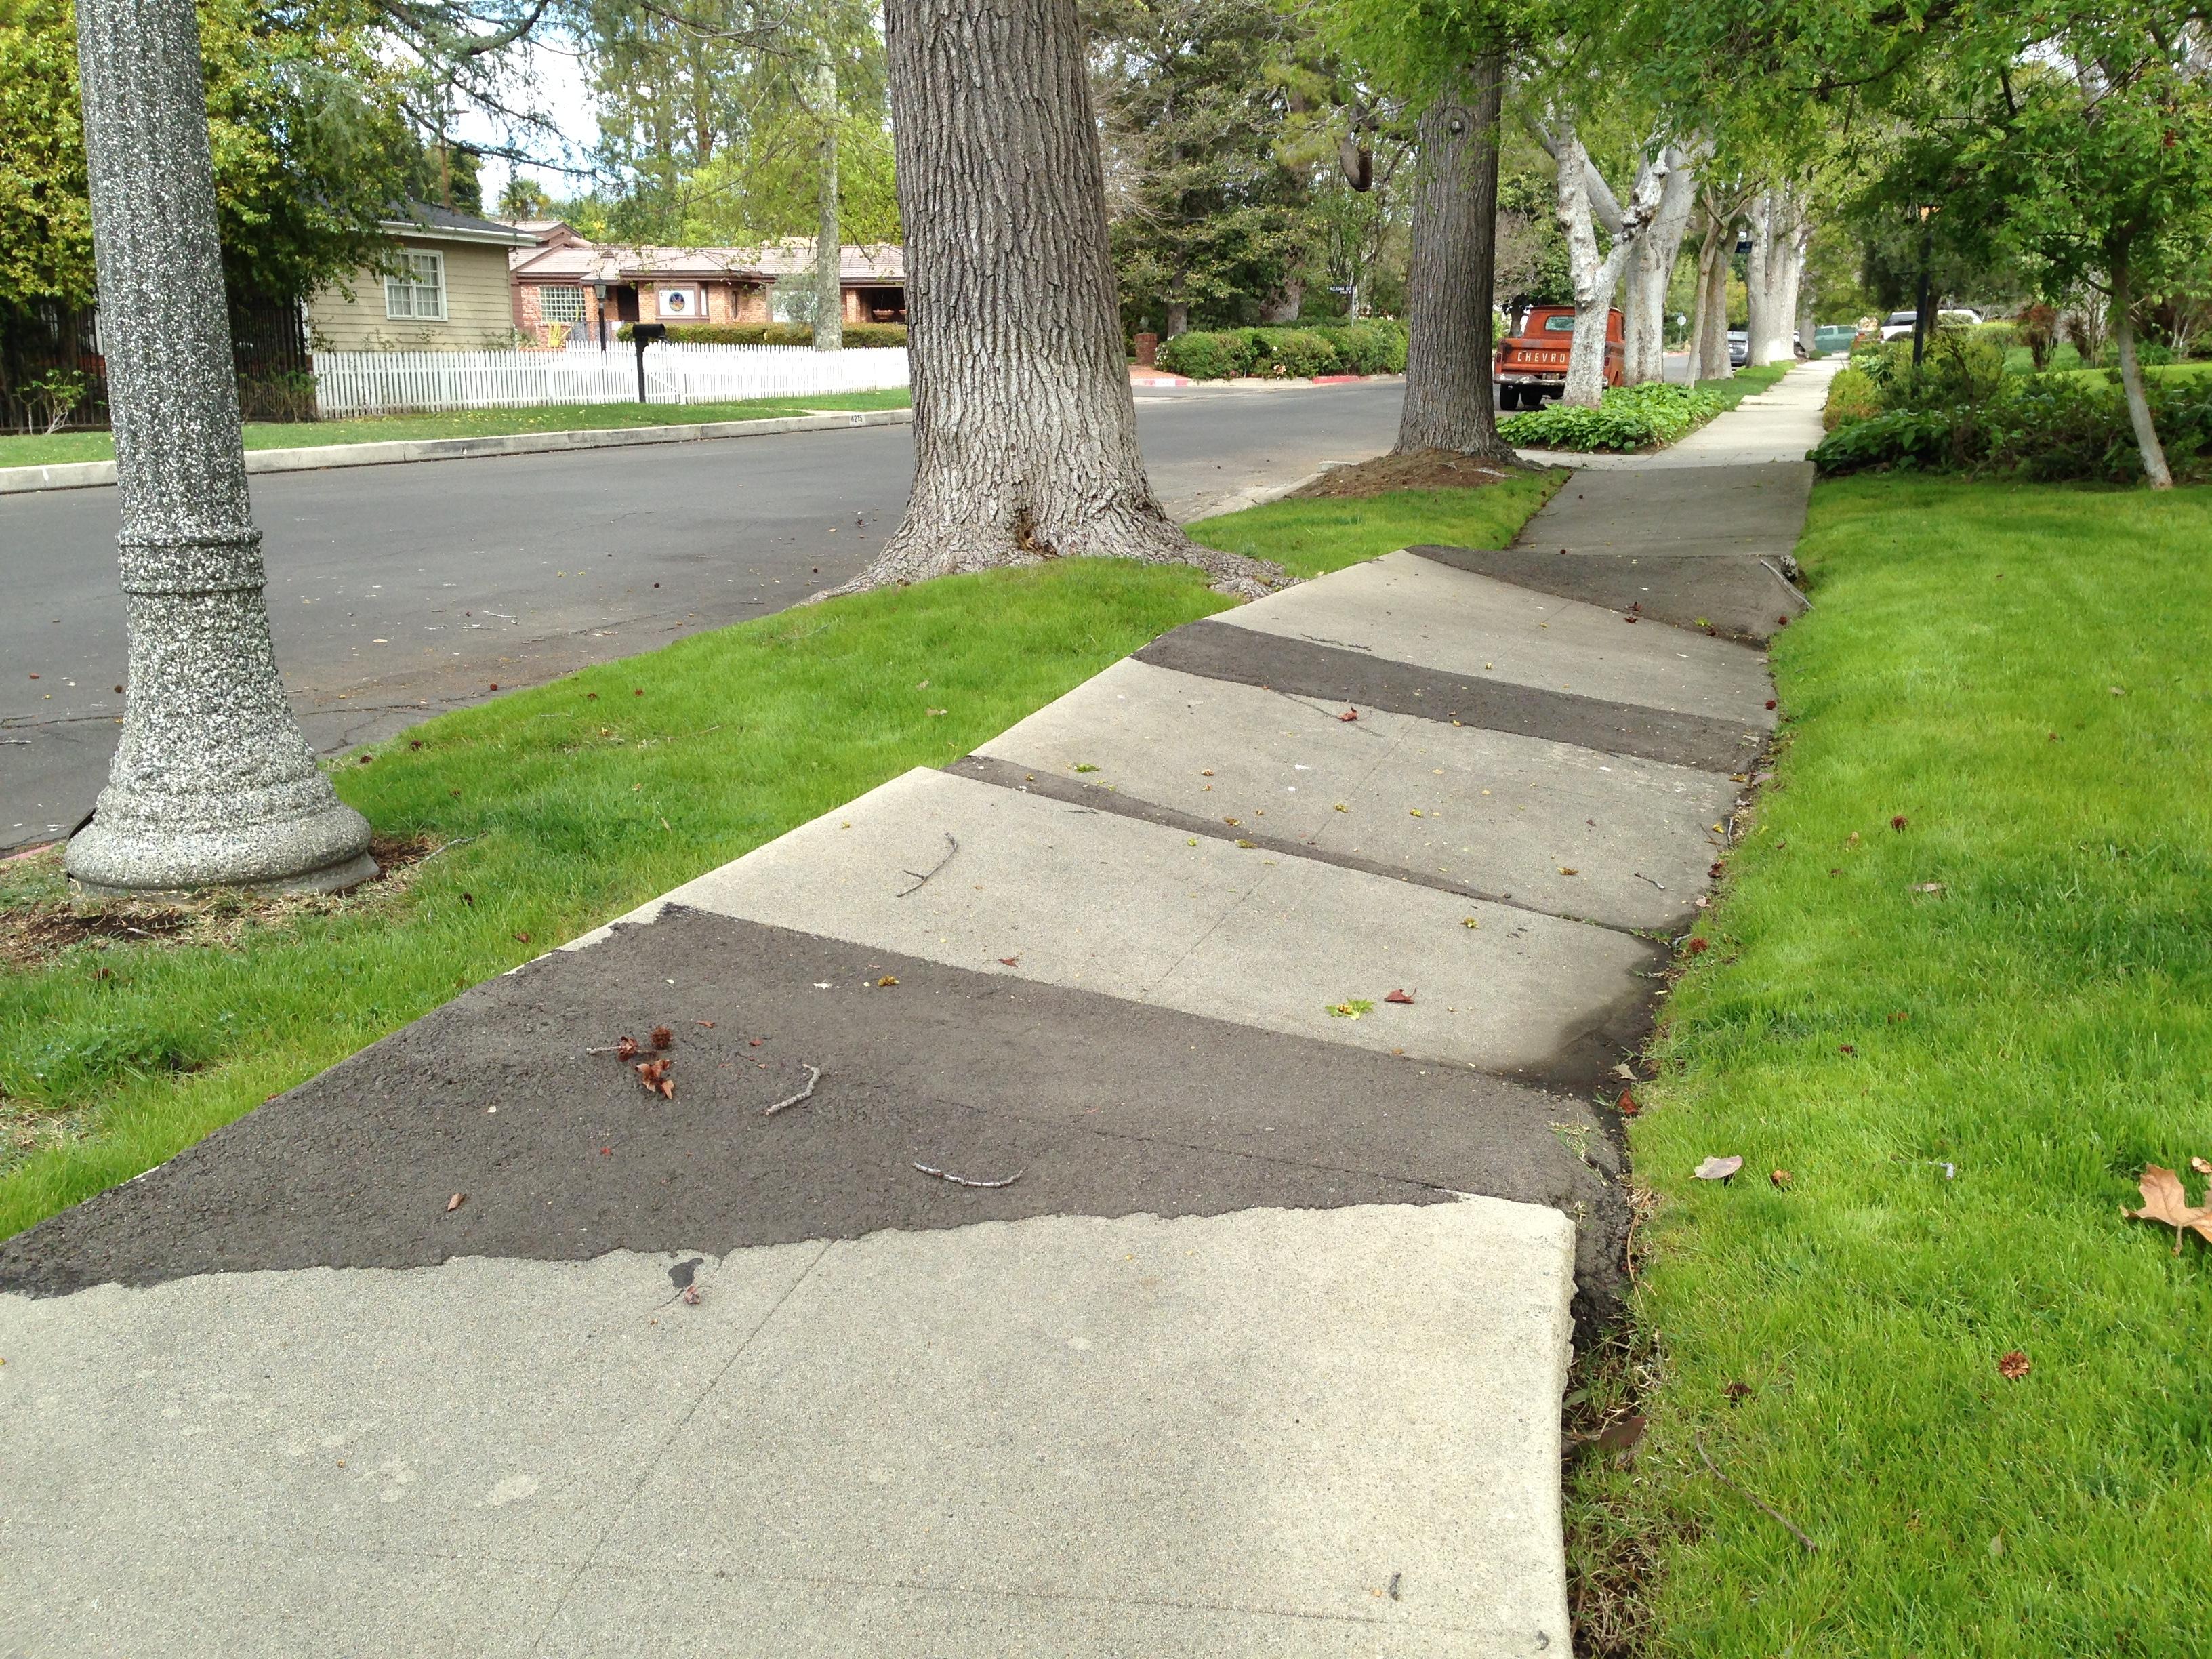 Sidewalk_(2).JPG